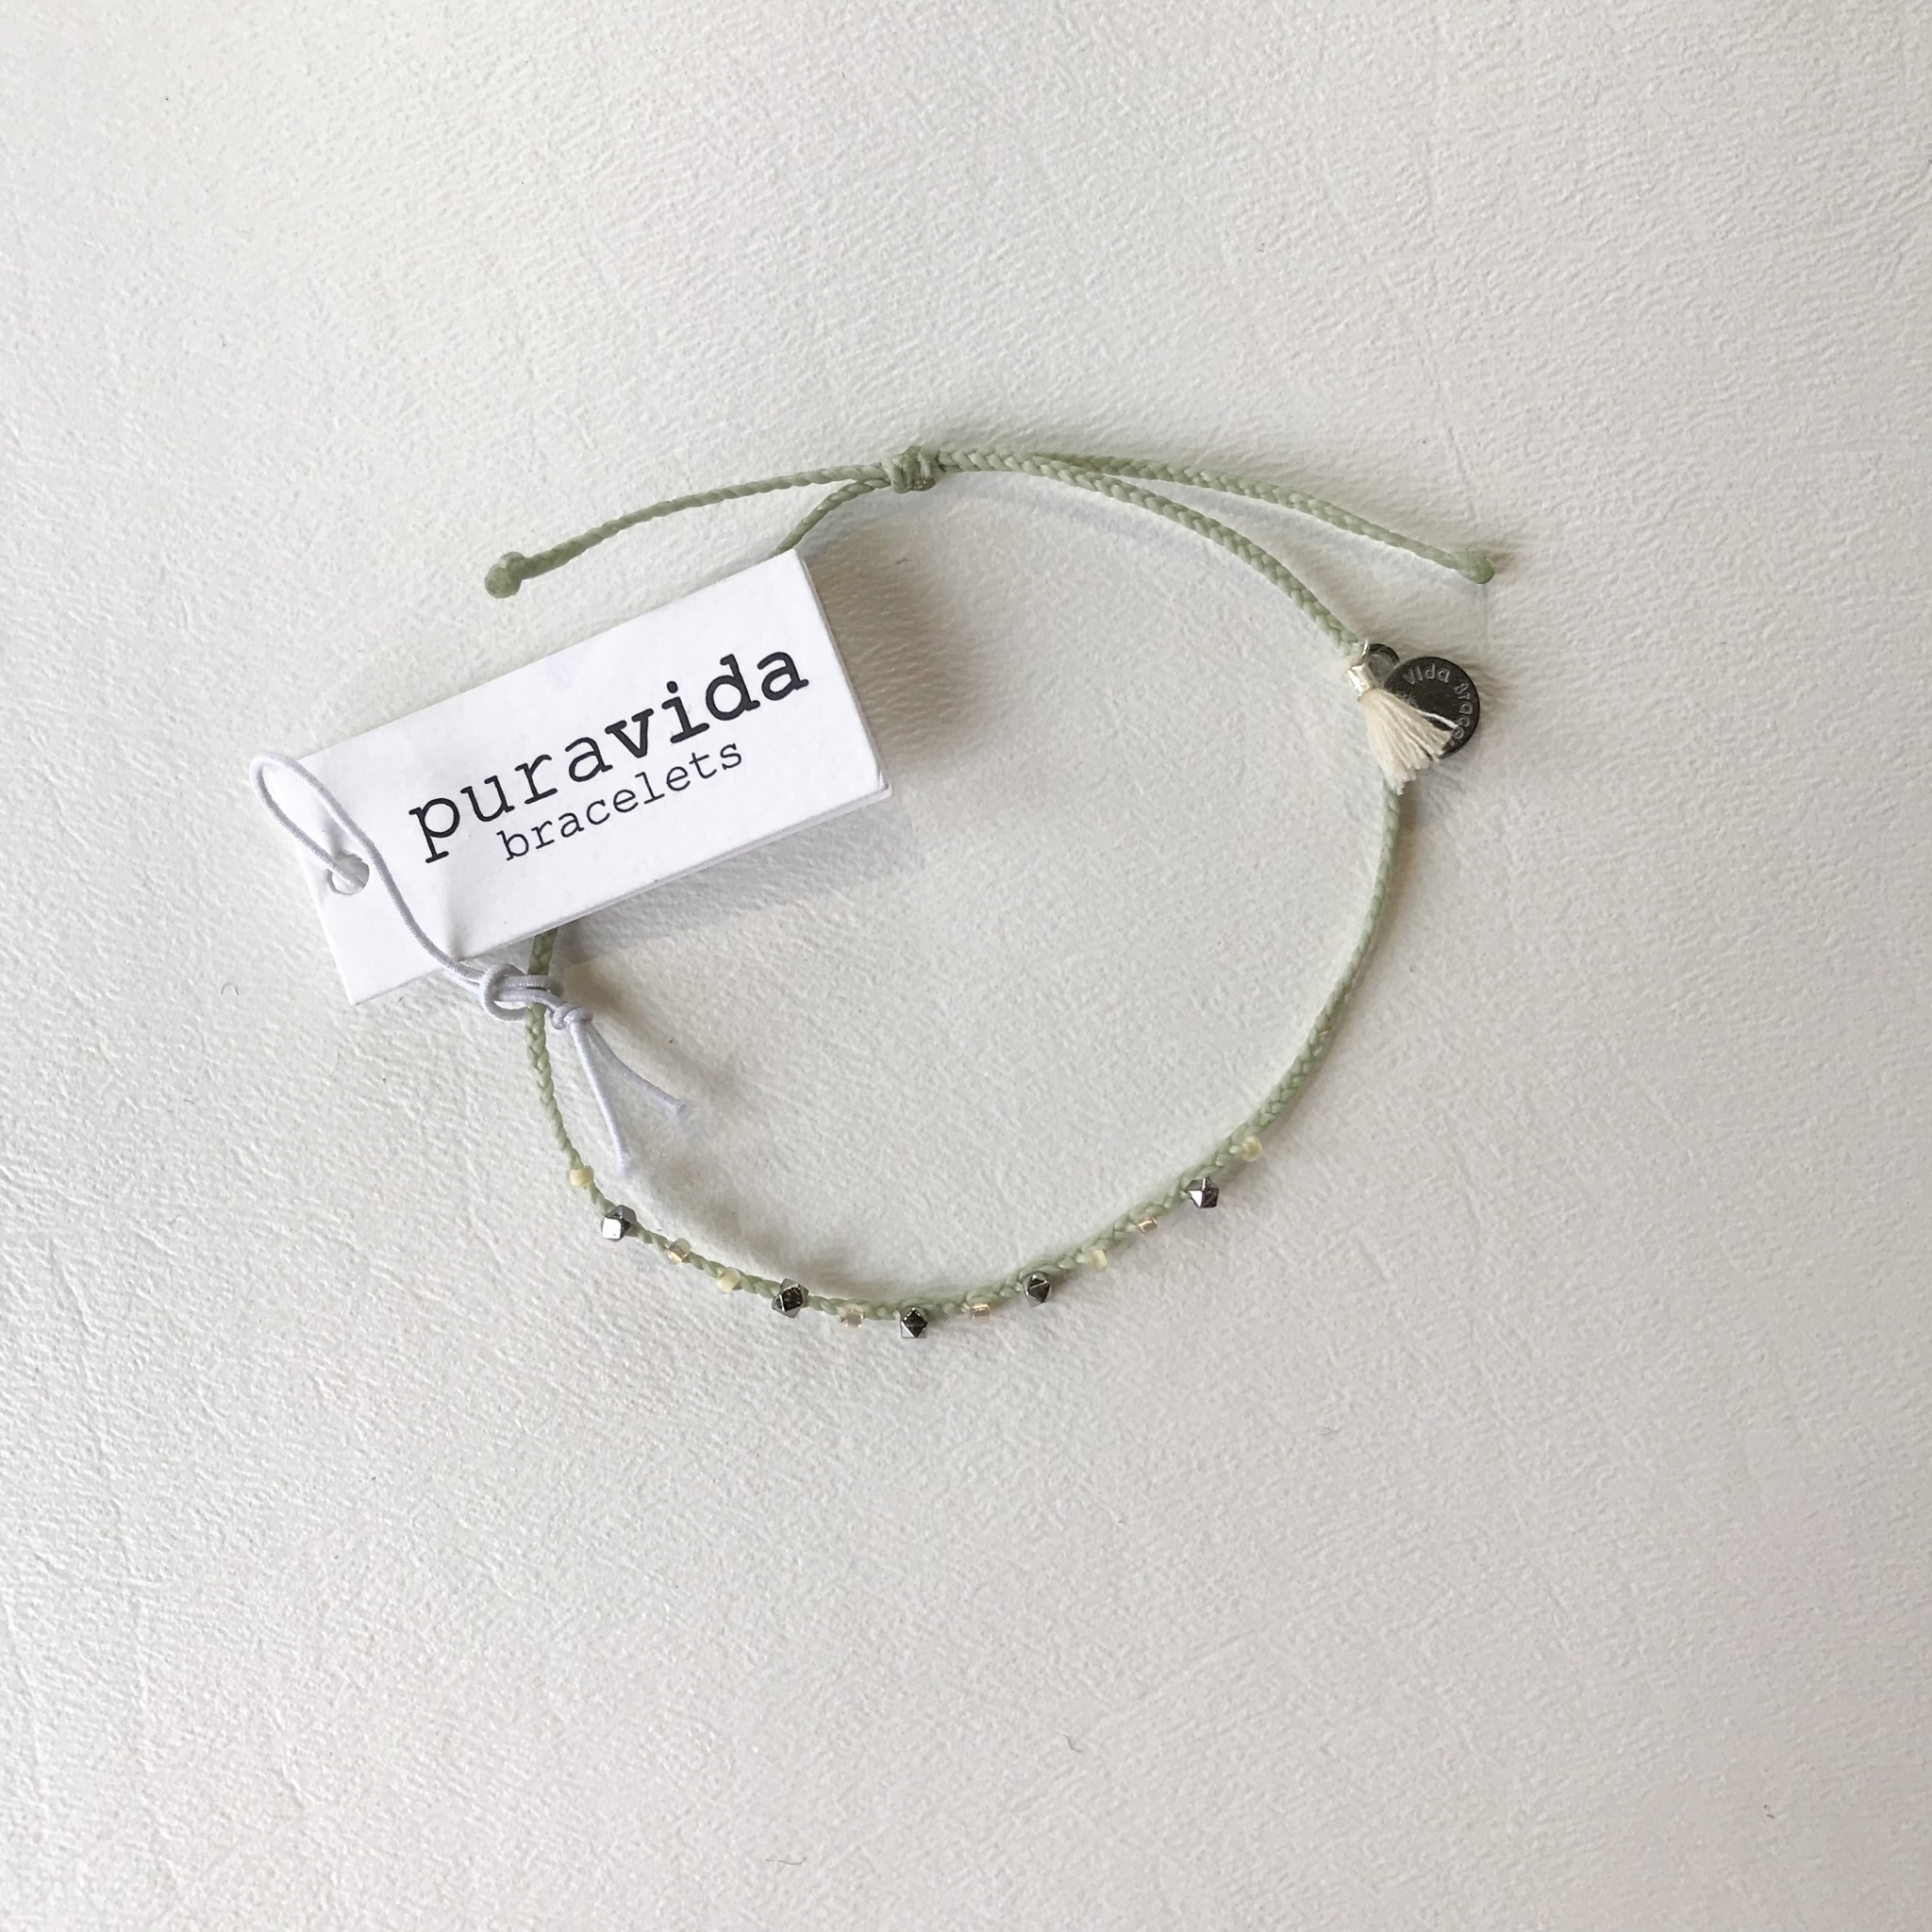 Puravida bead and braid